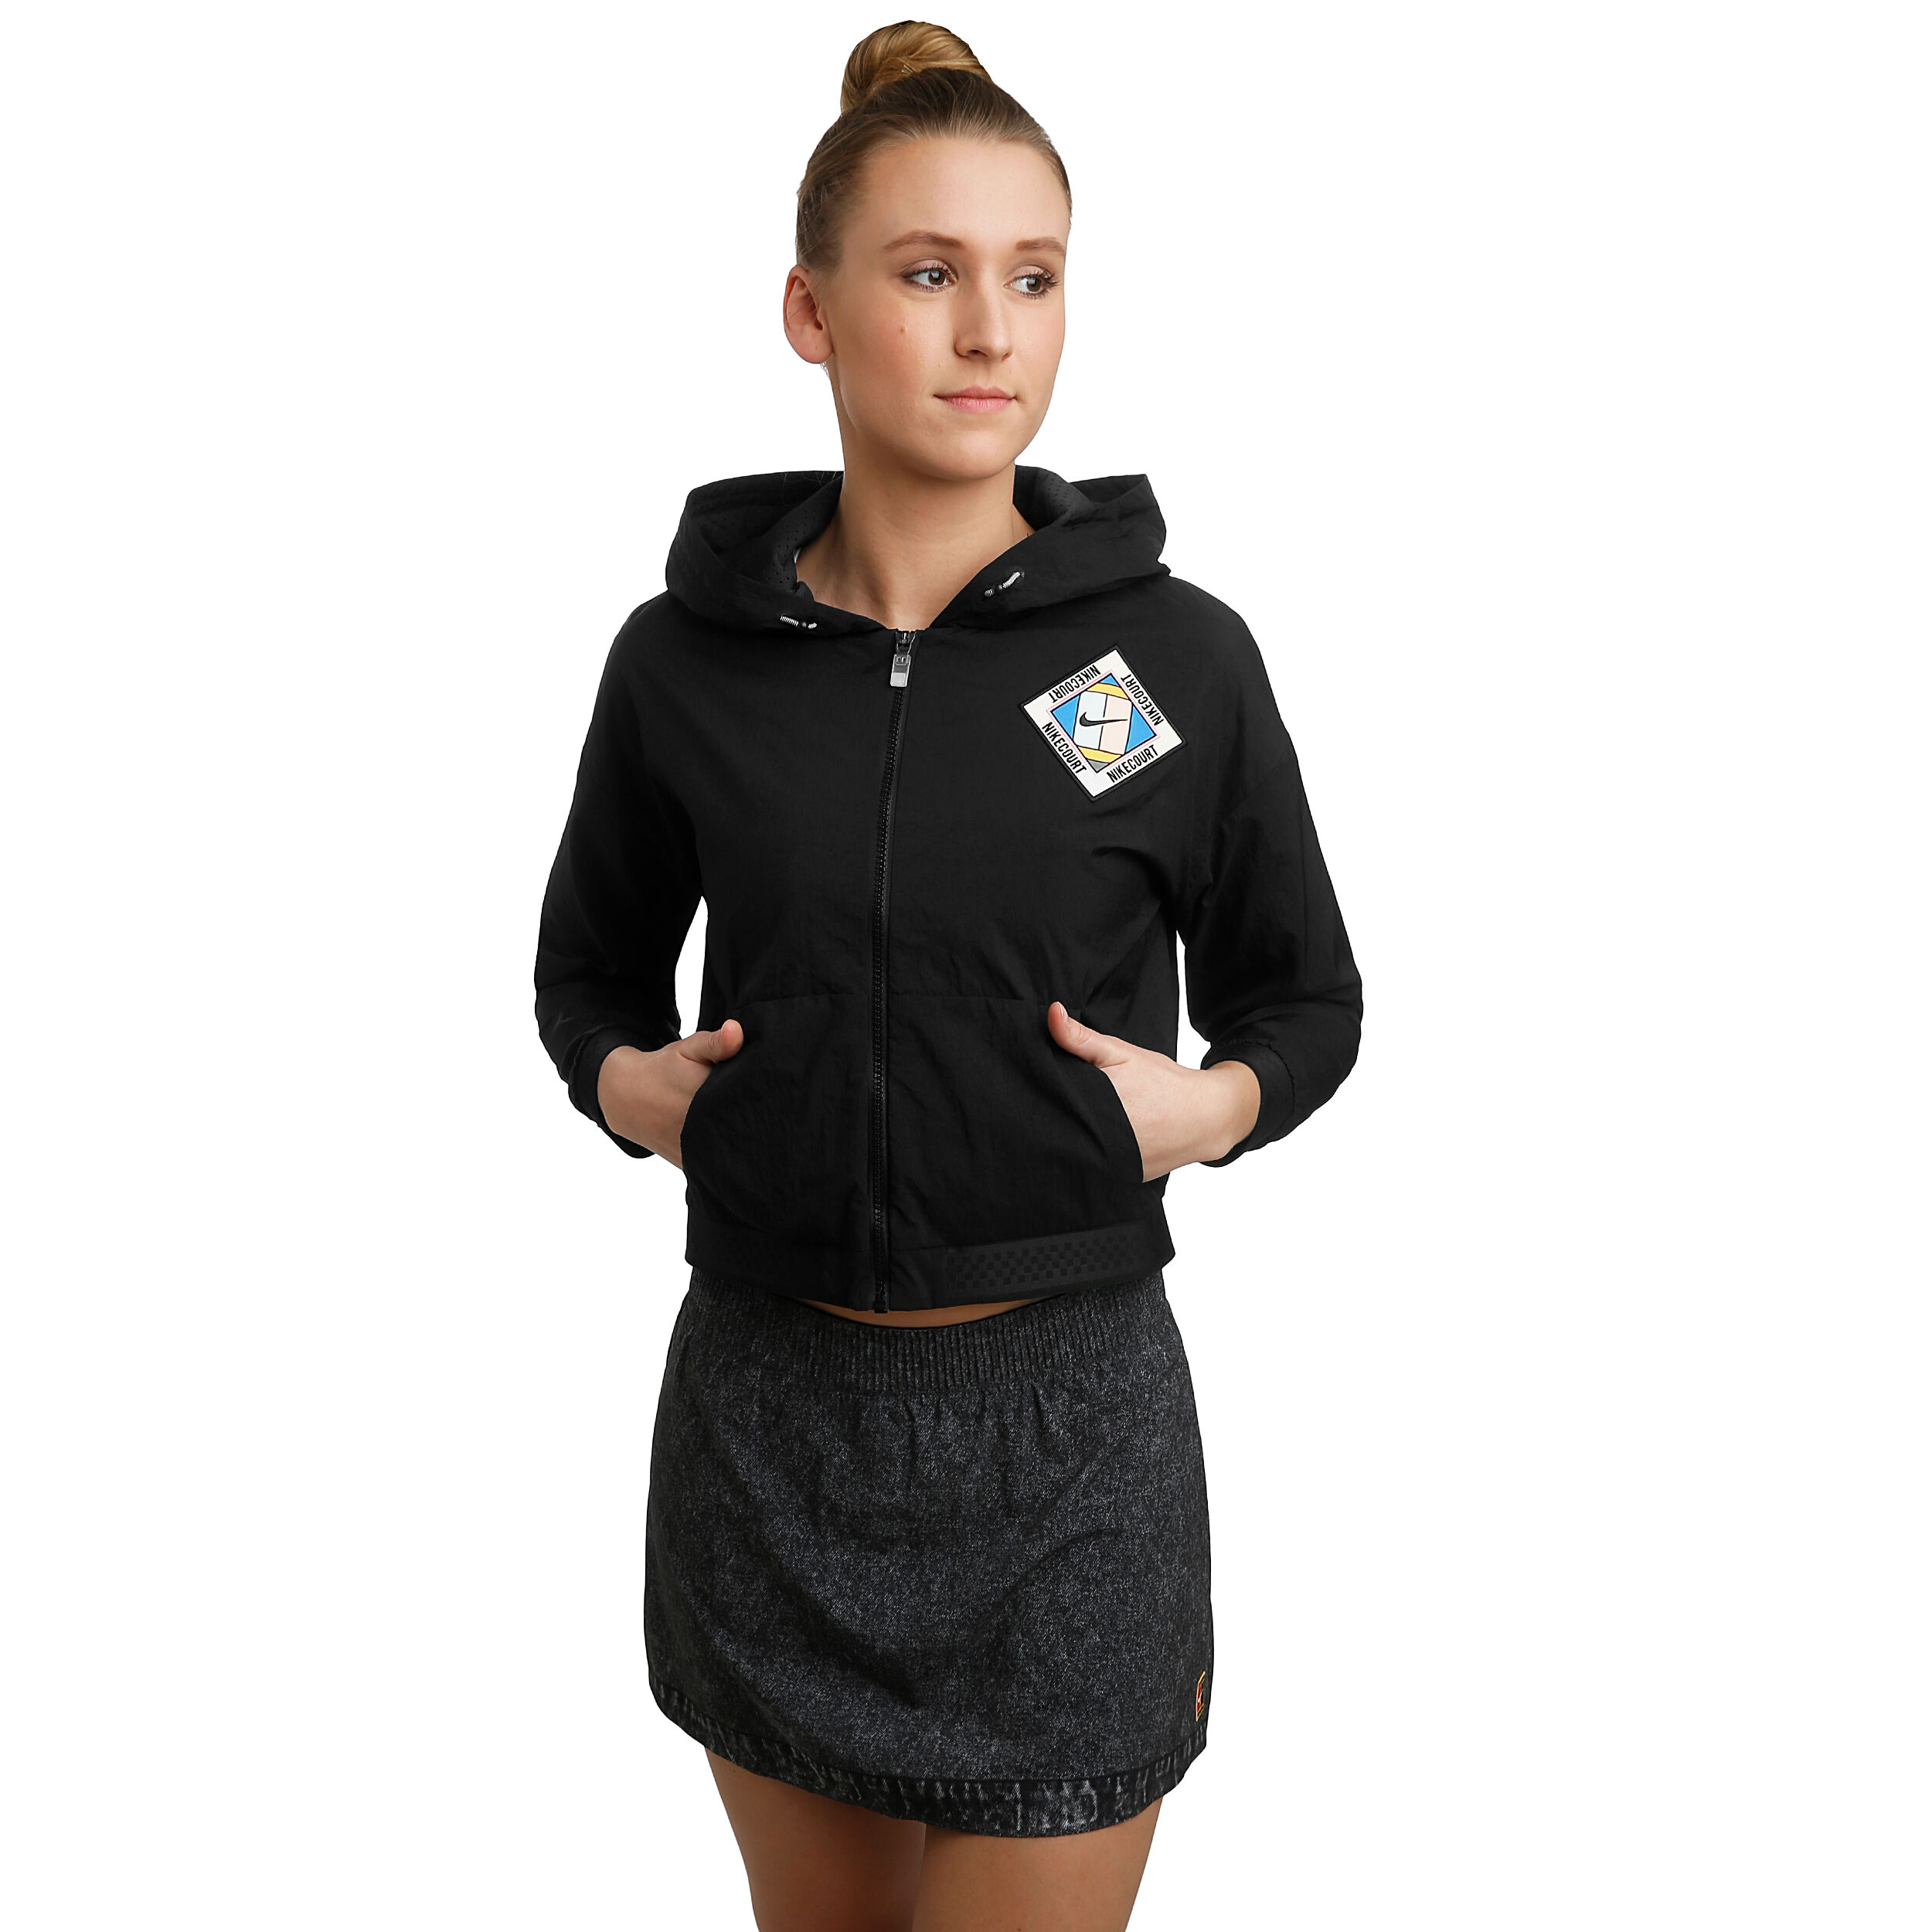 Kaufen Stadium Court SchwarzBlau Damen Nike Online iPZOkXu